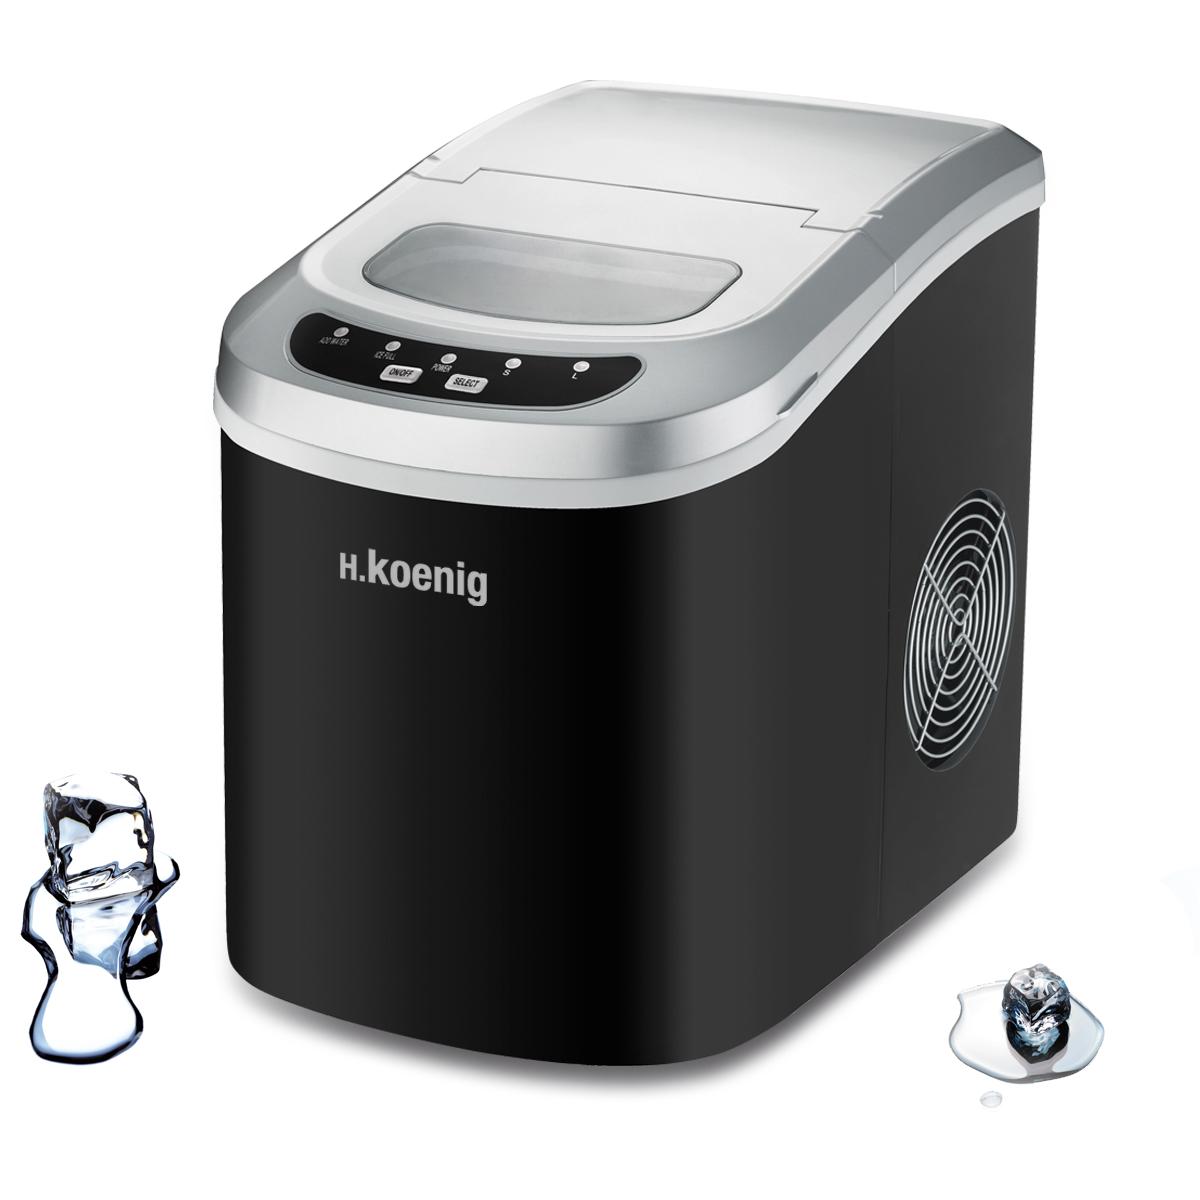 H koenig kube kb12 machine a glacons 12kg 24h neuve ebay - Machine a glacon kube ...